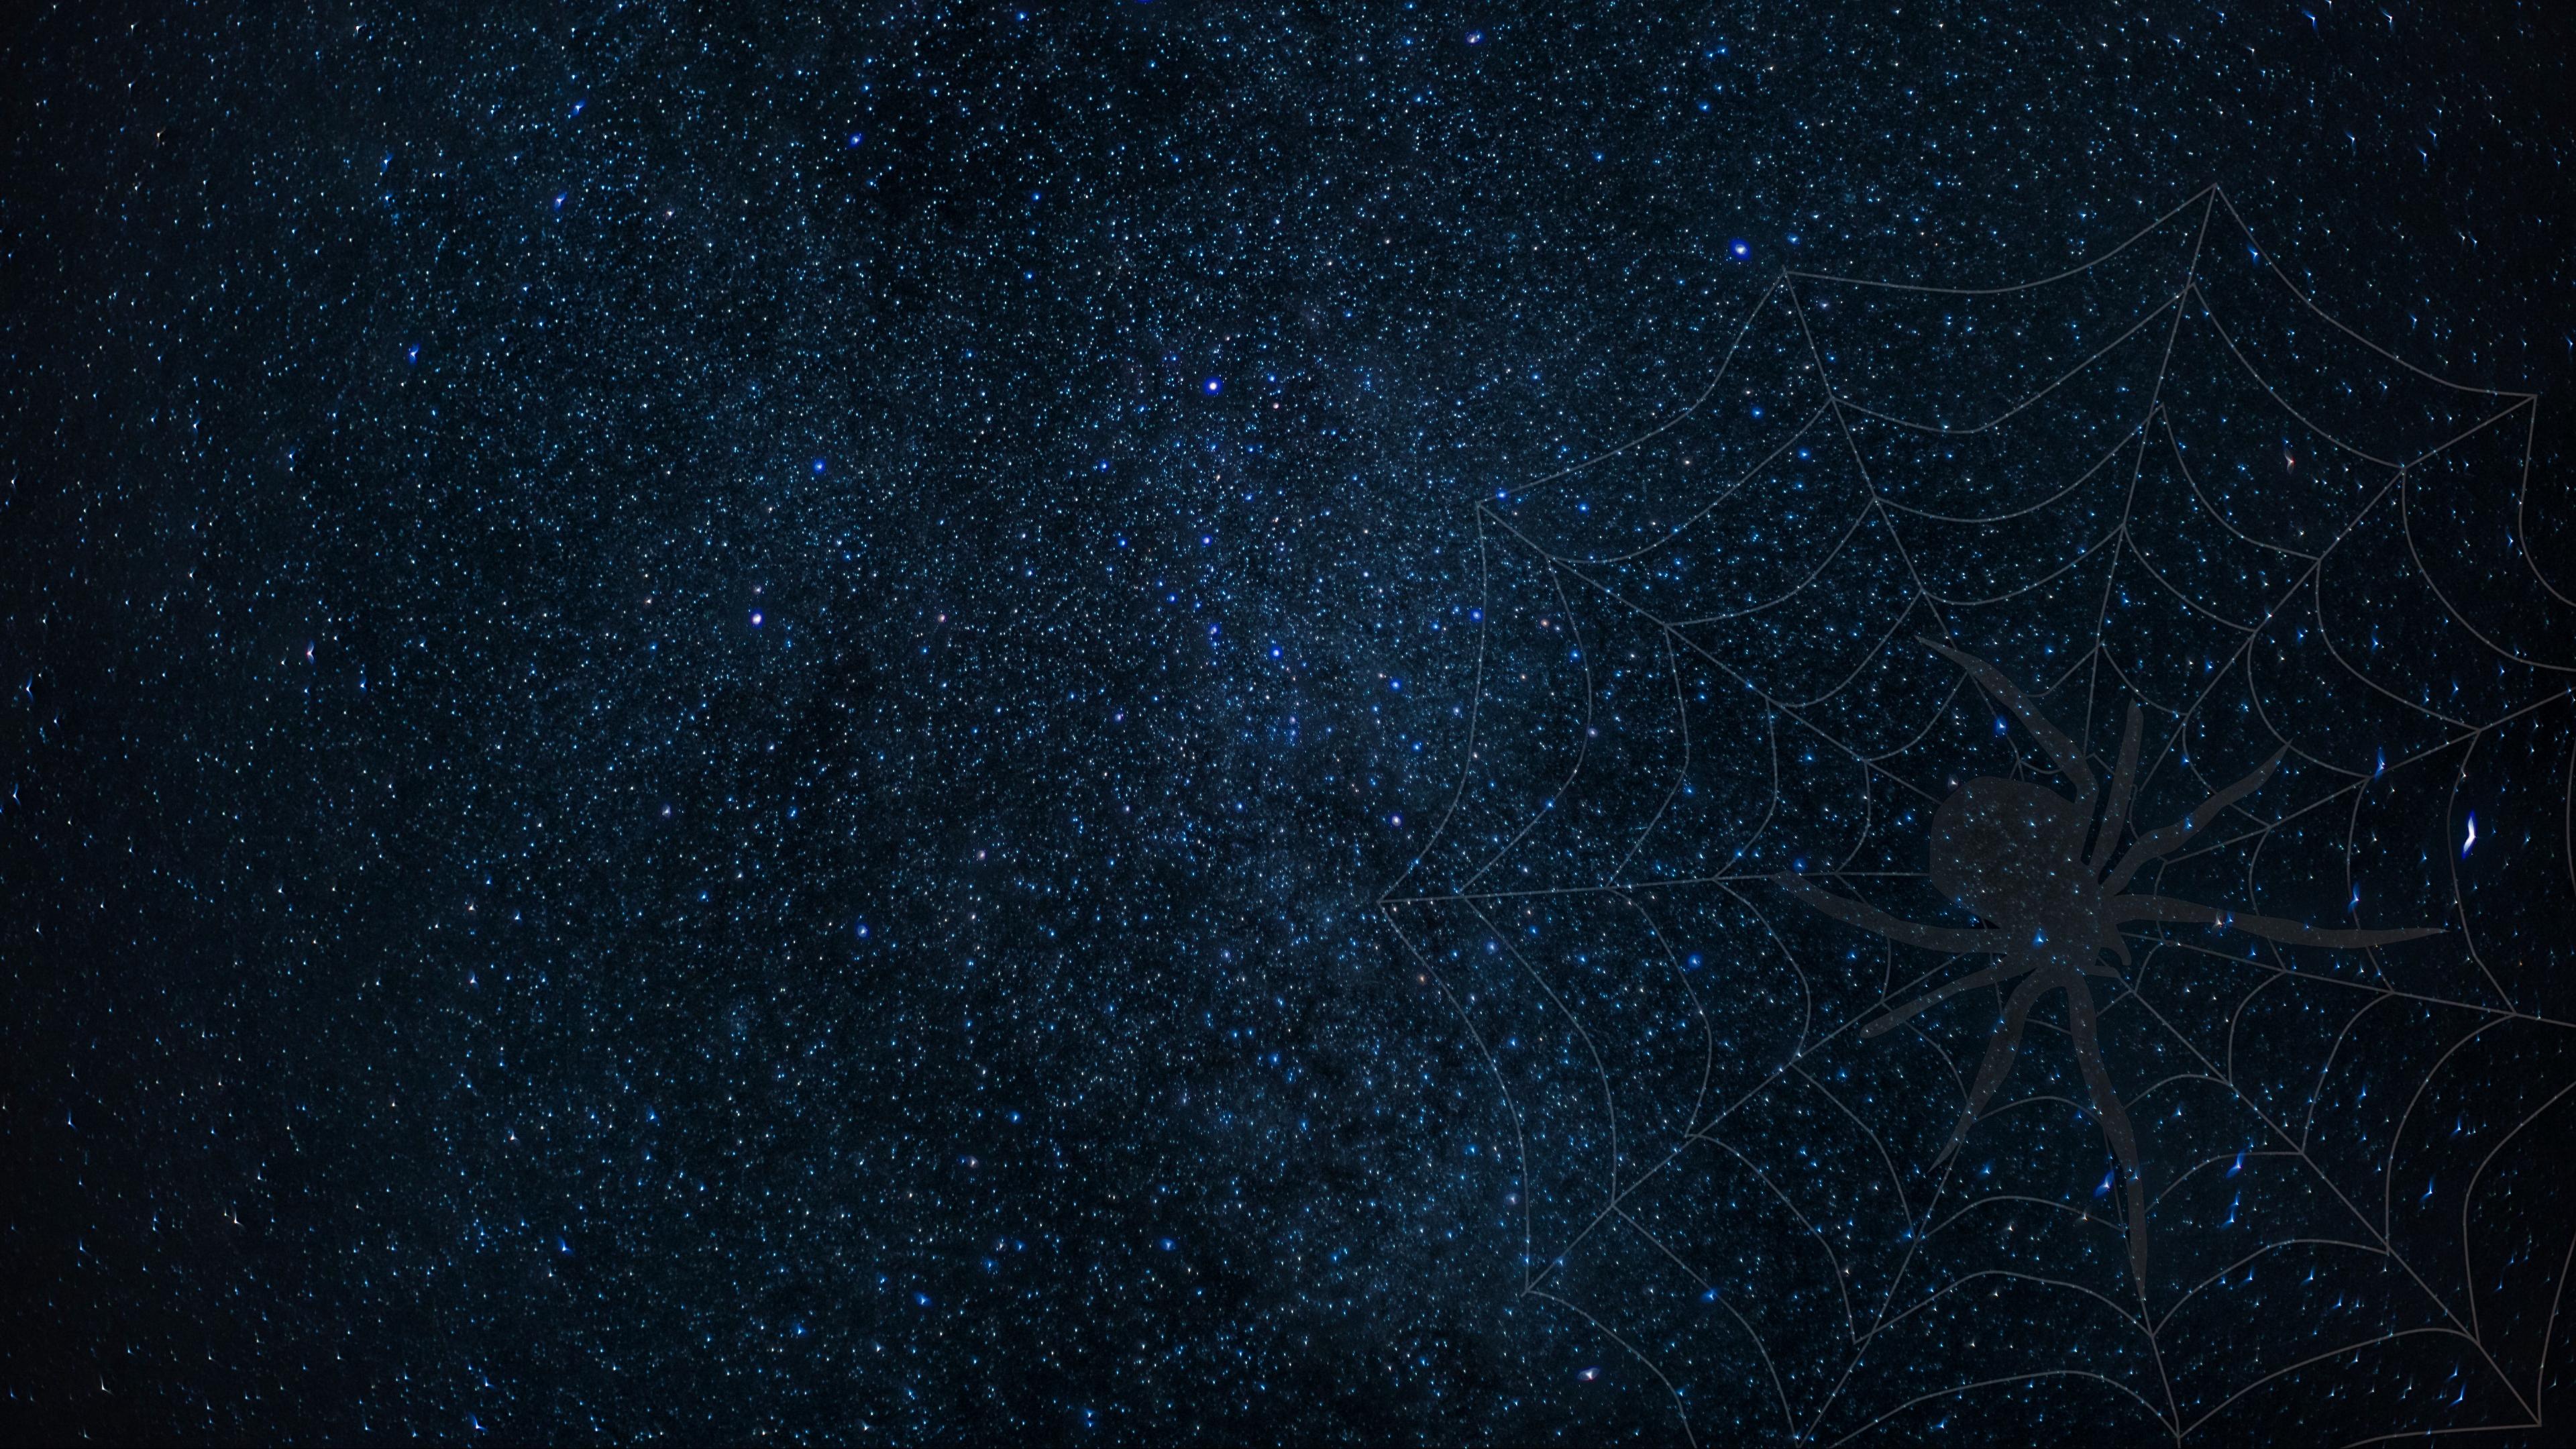 cobweb spider starry sky shine 4k 1540575140 - cobweb, spider, starry sky, shine 4k - starry sky, Spider, cobweb